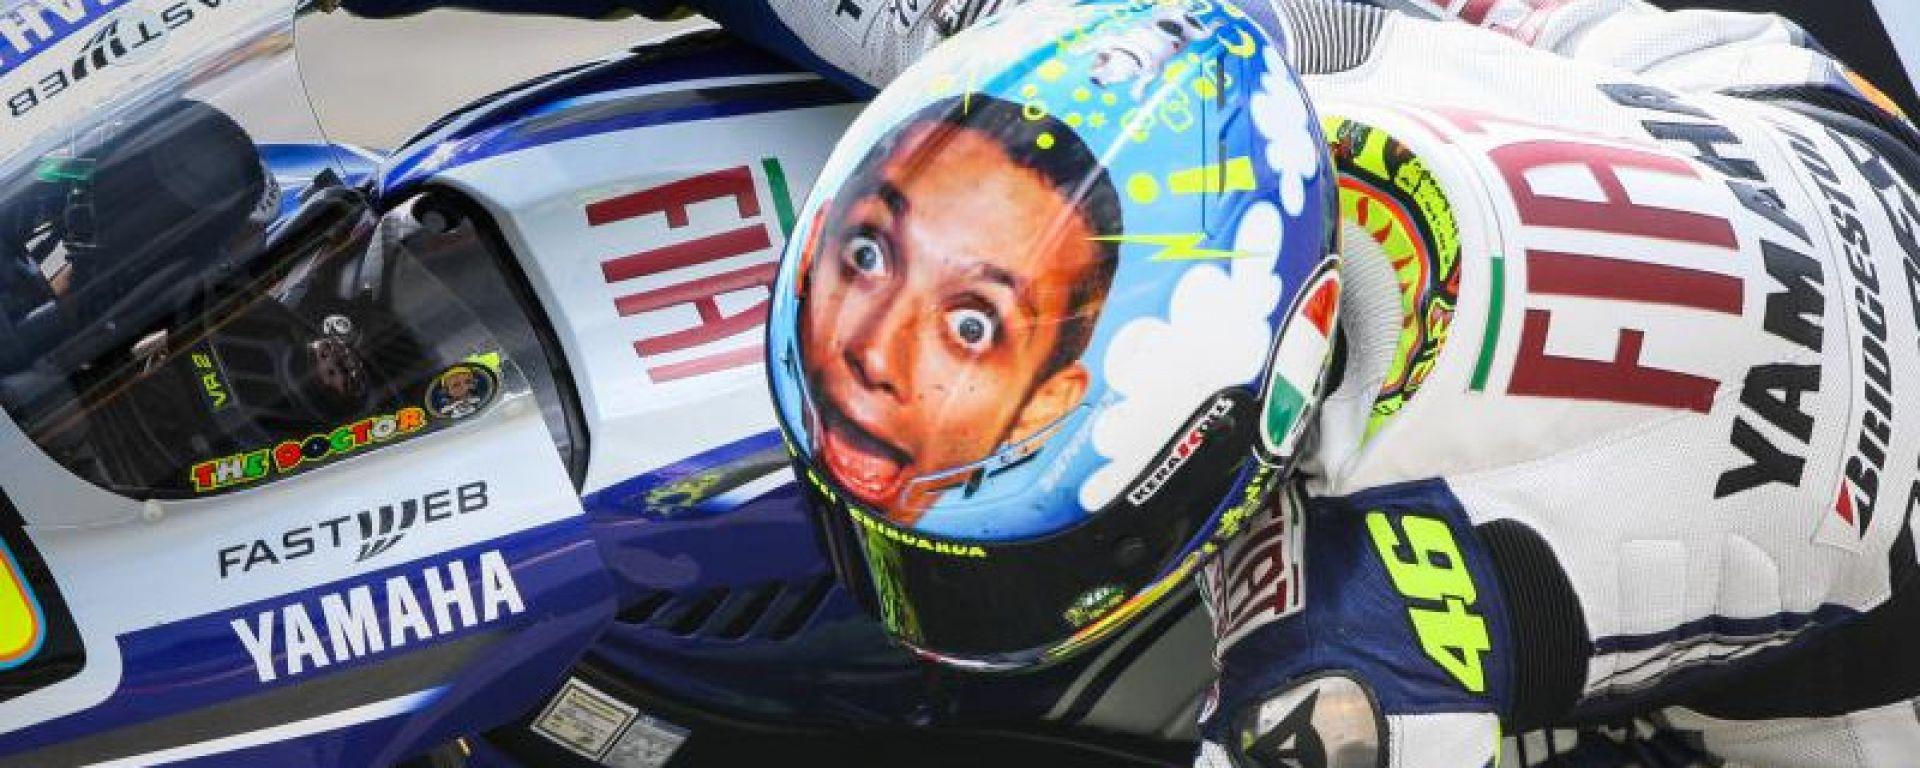 Valentino Rossi (Yamaha) al Mugello 2009